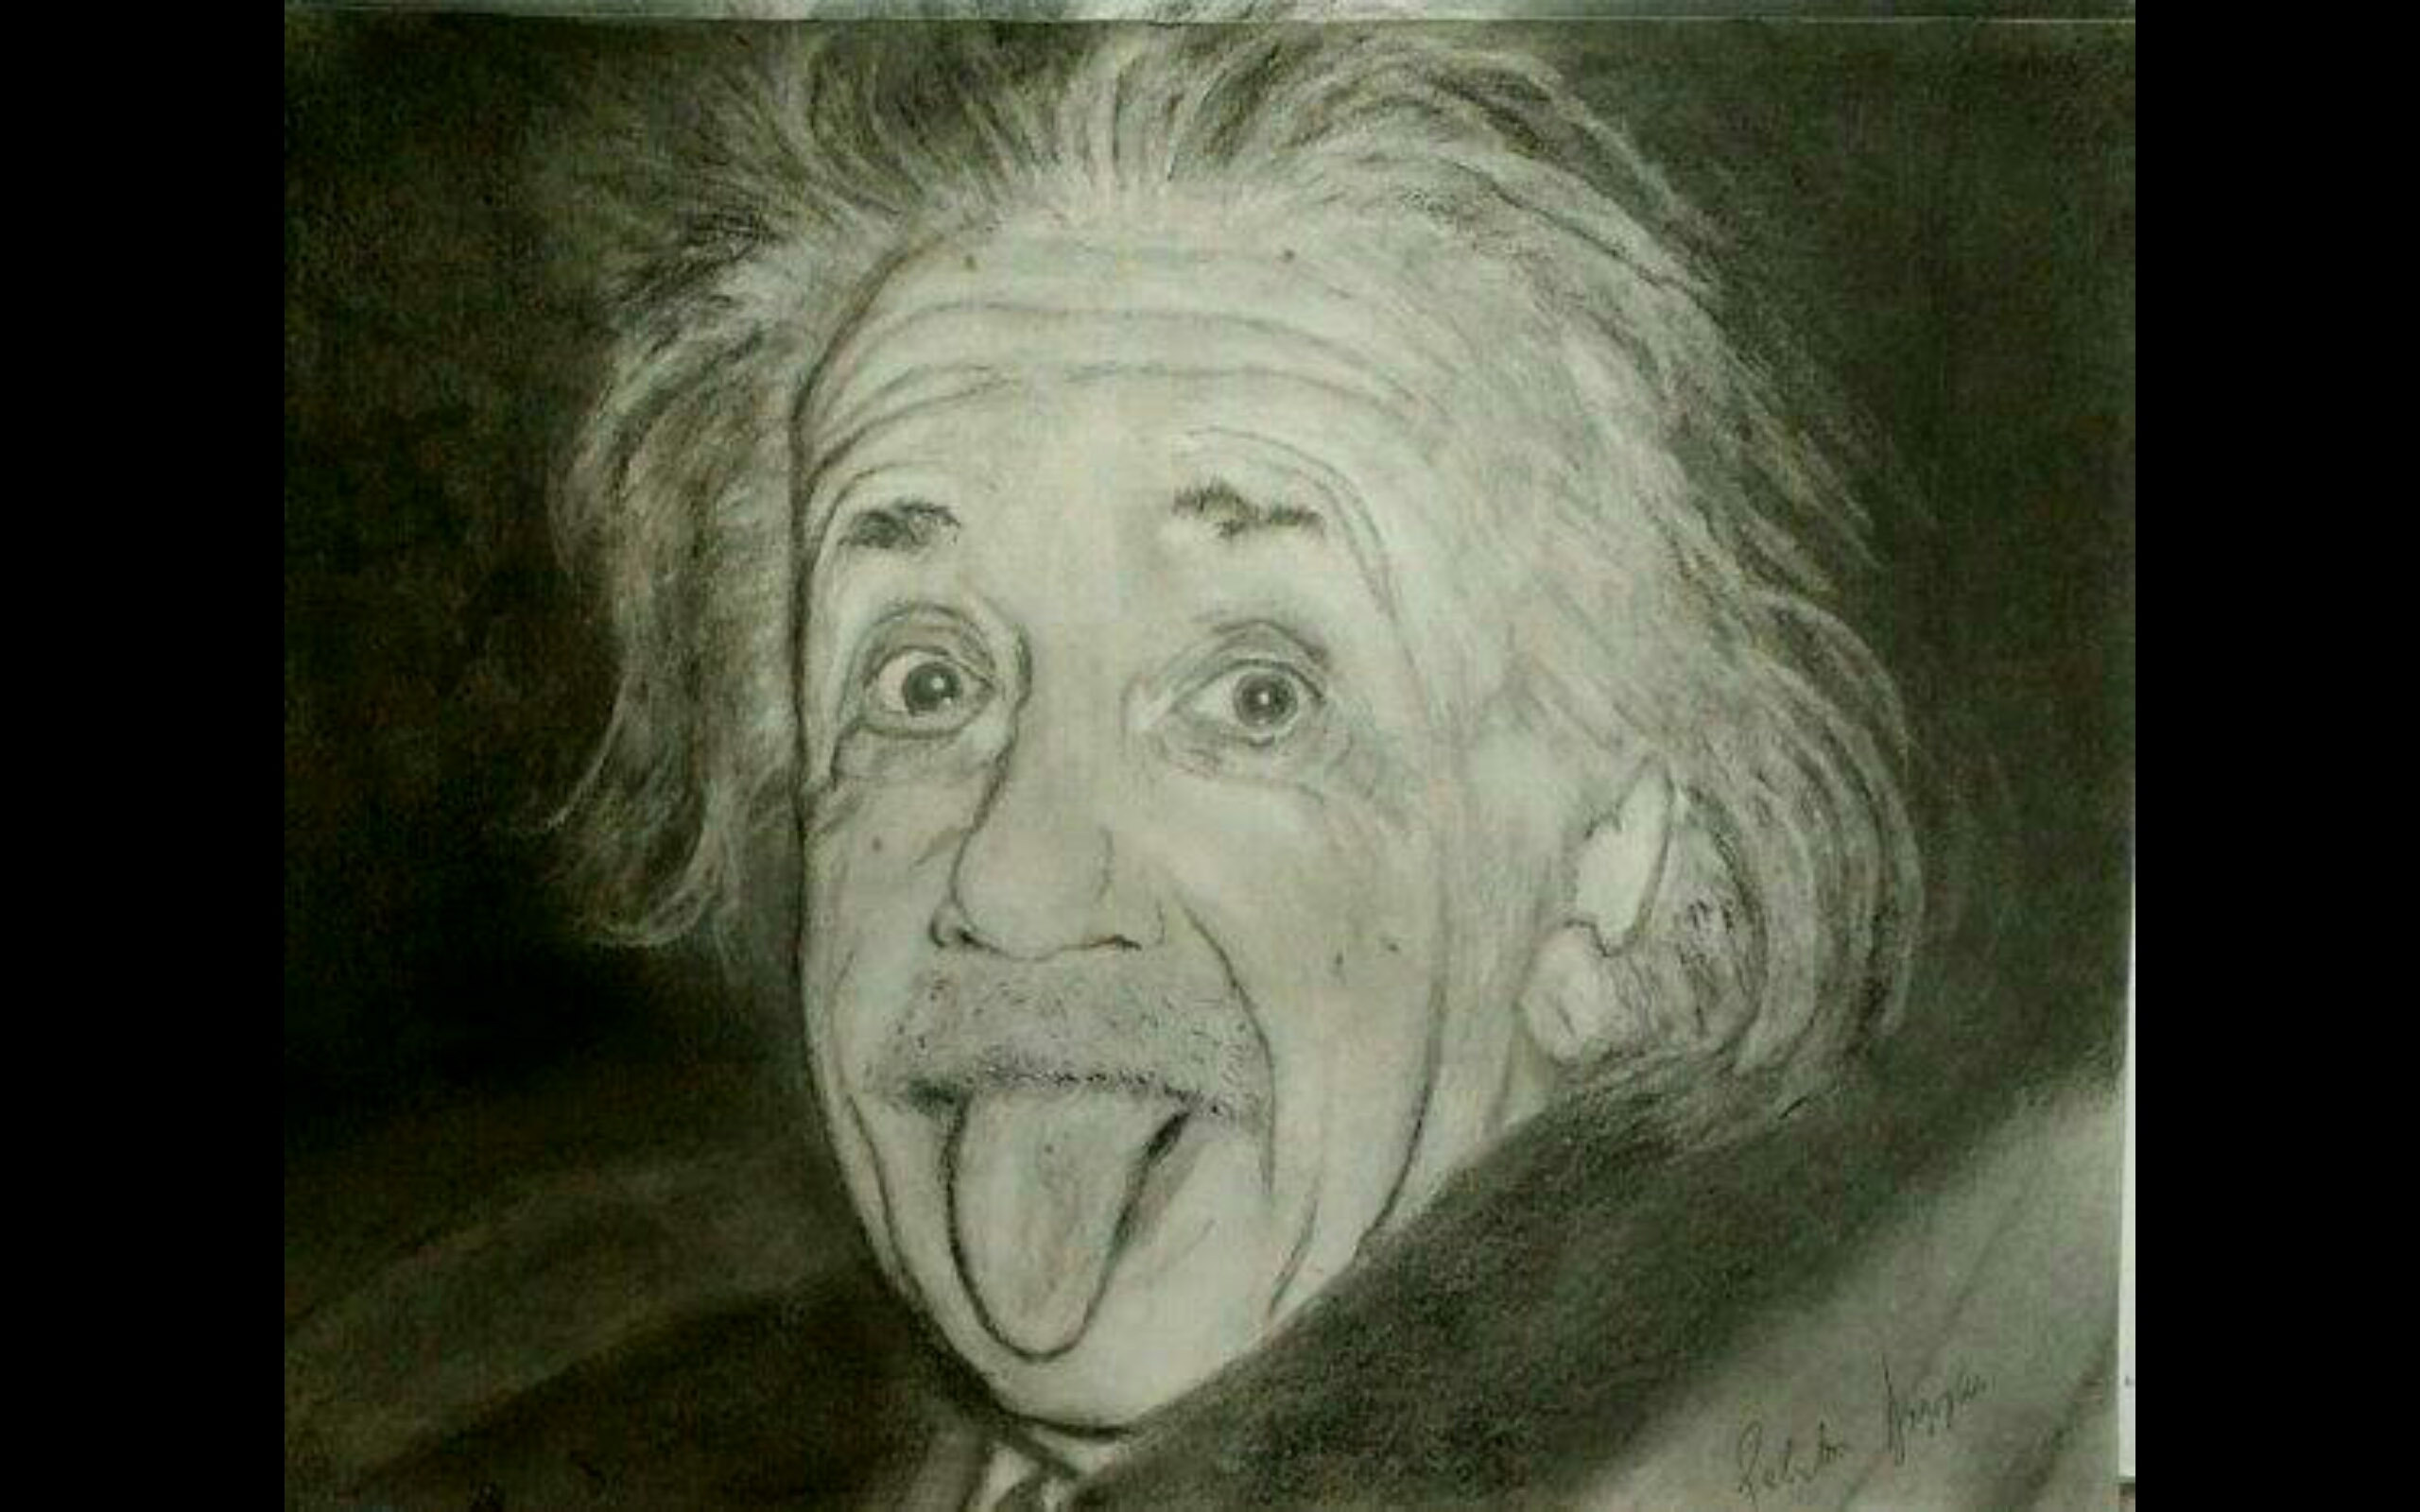 Albert einstein portrait drawing painting aiudqh